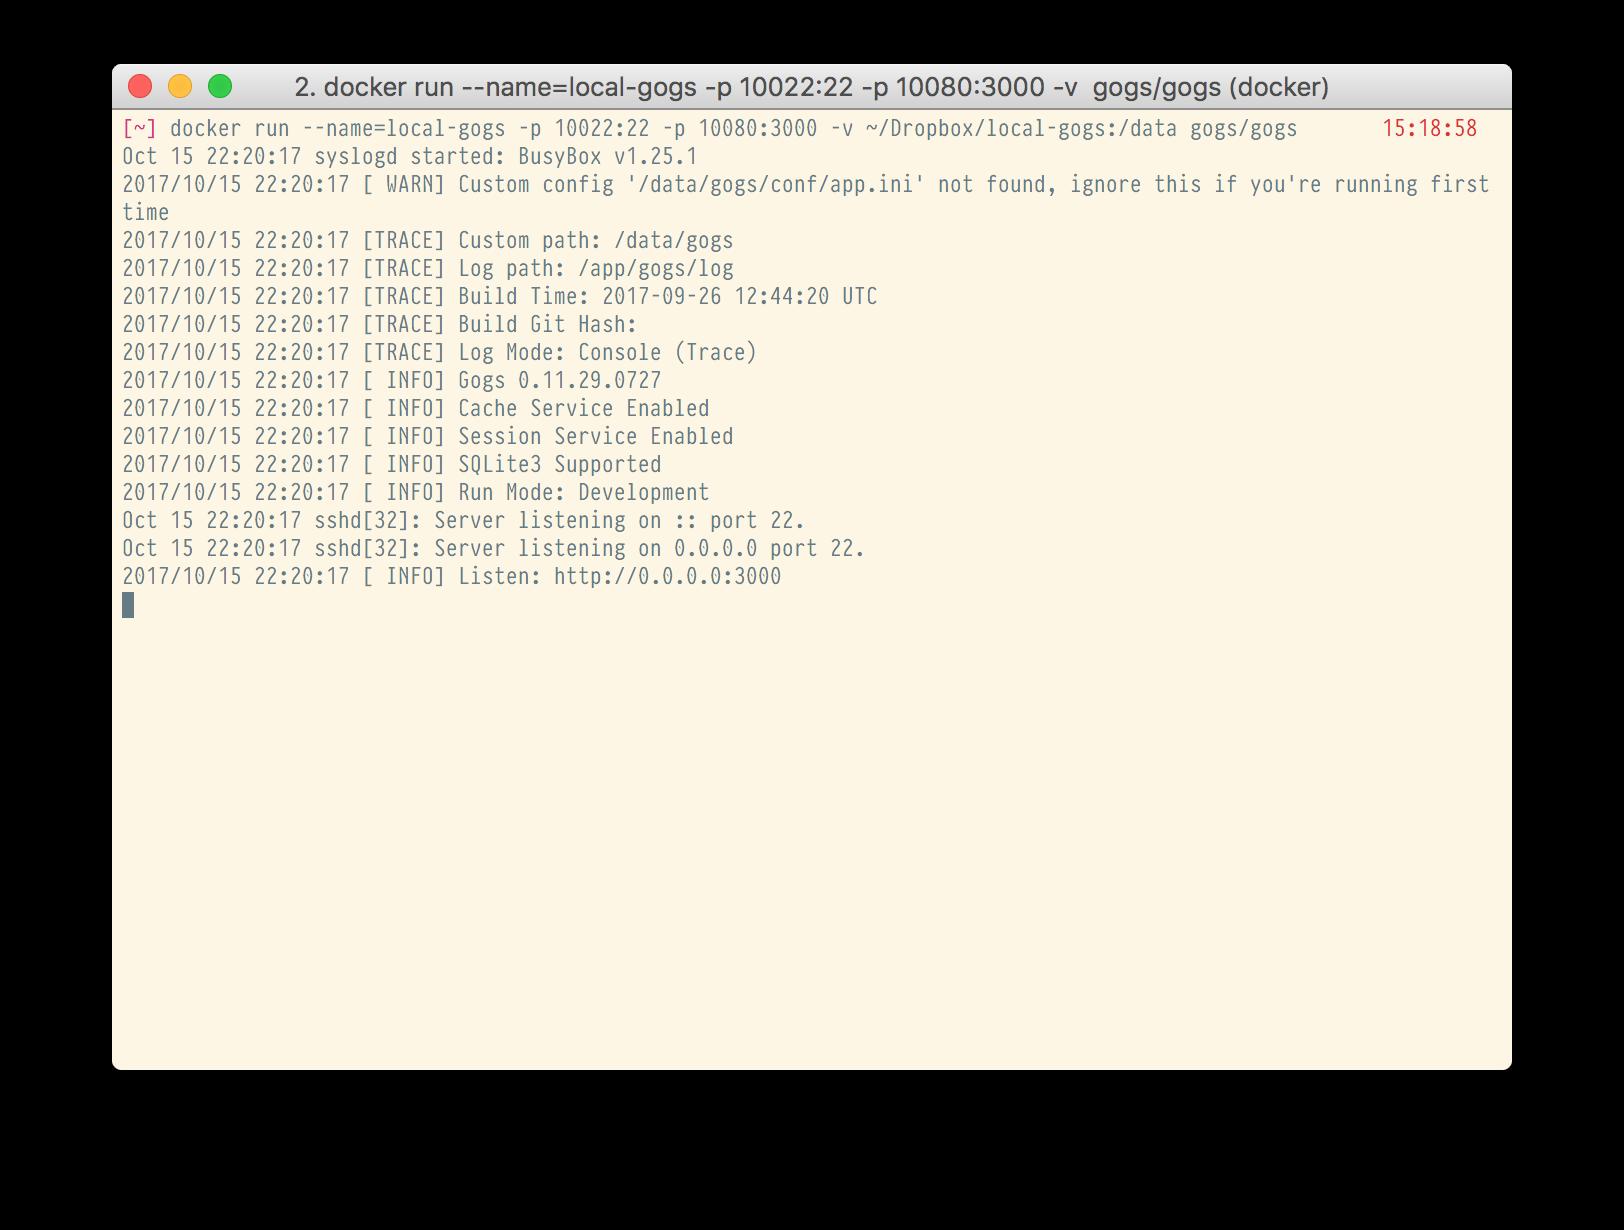 Local GitHub-like source control on Mac with Gogs, Docker, and Dropbox